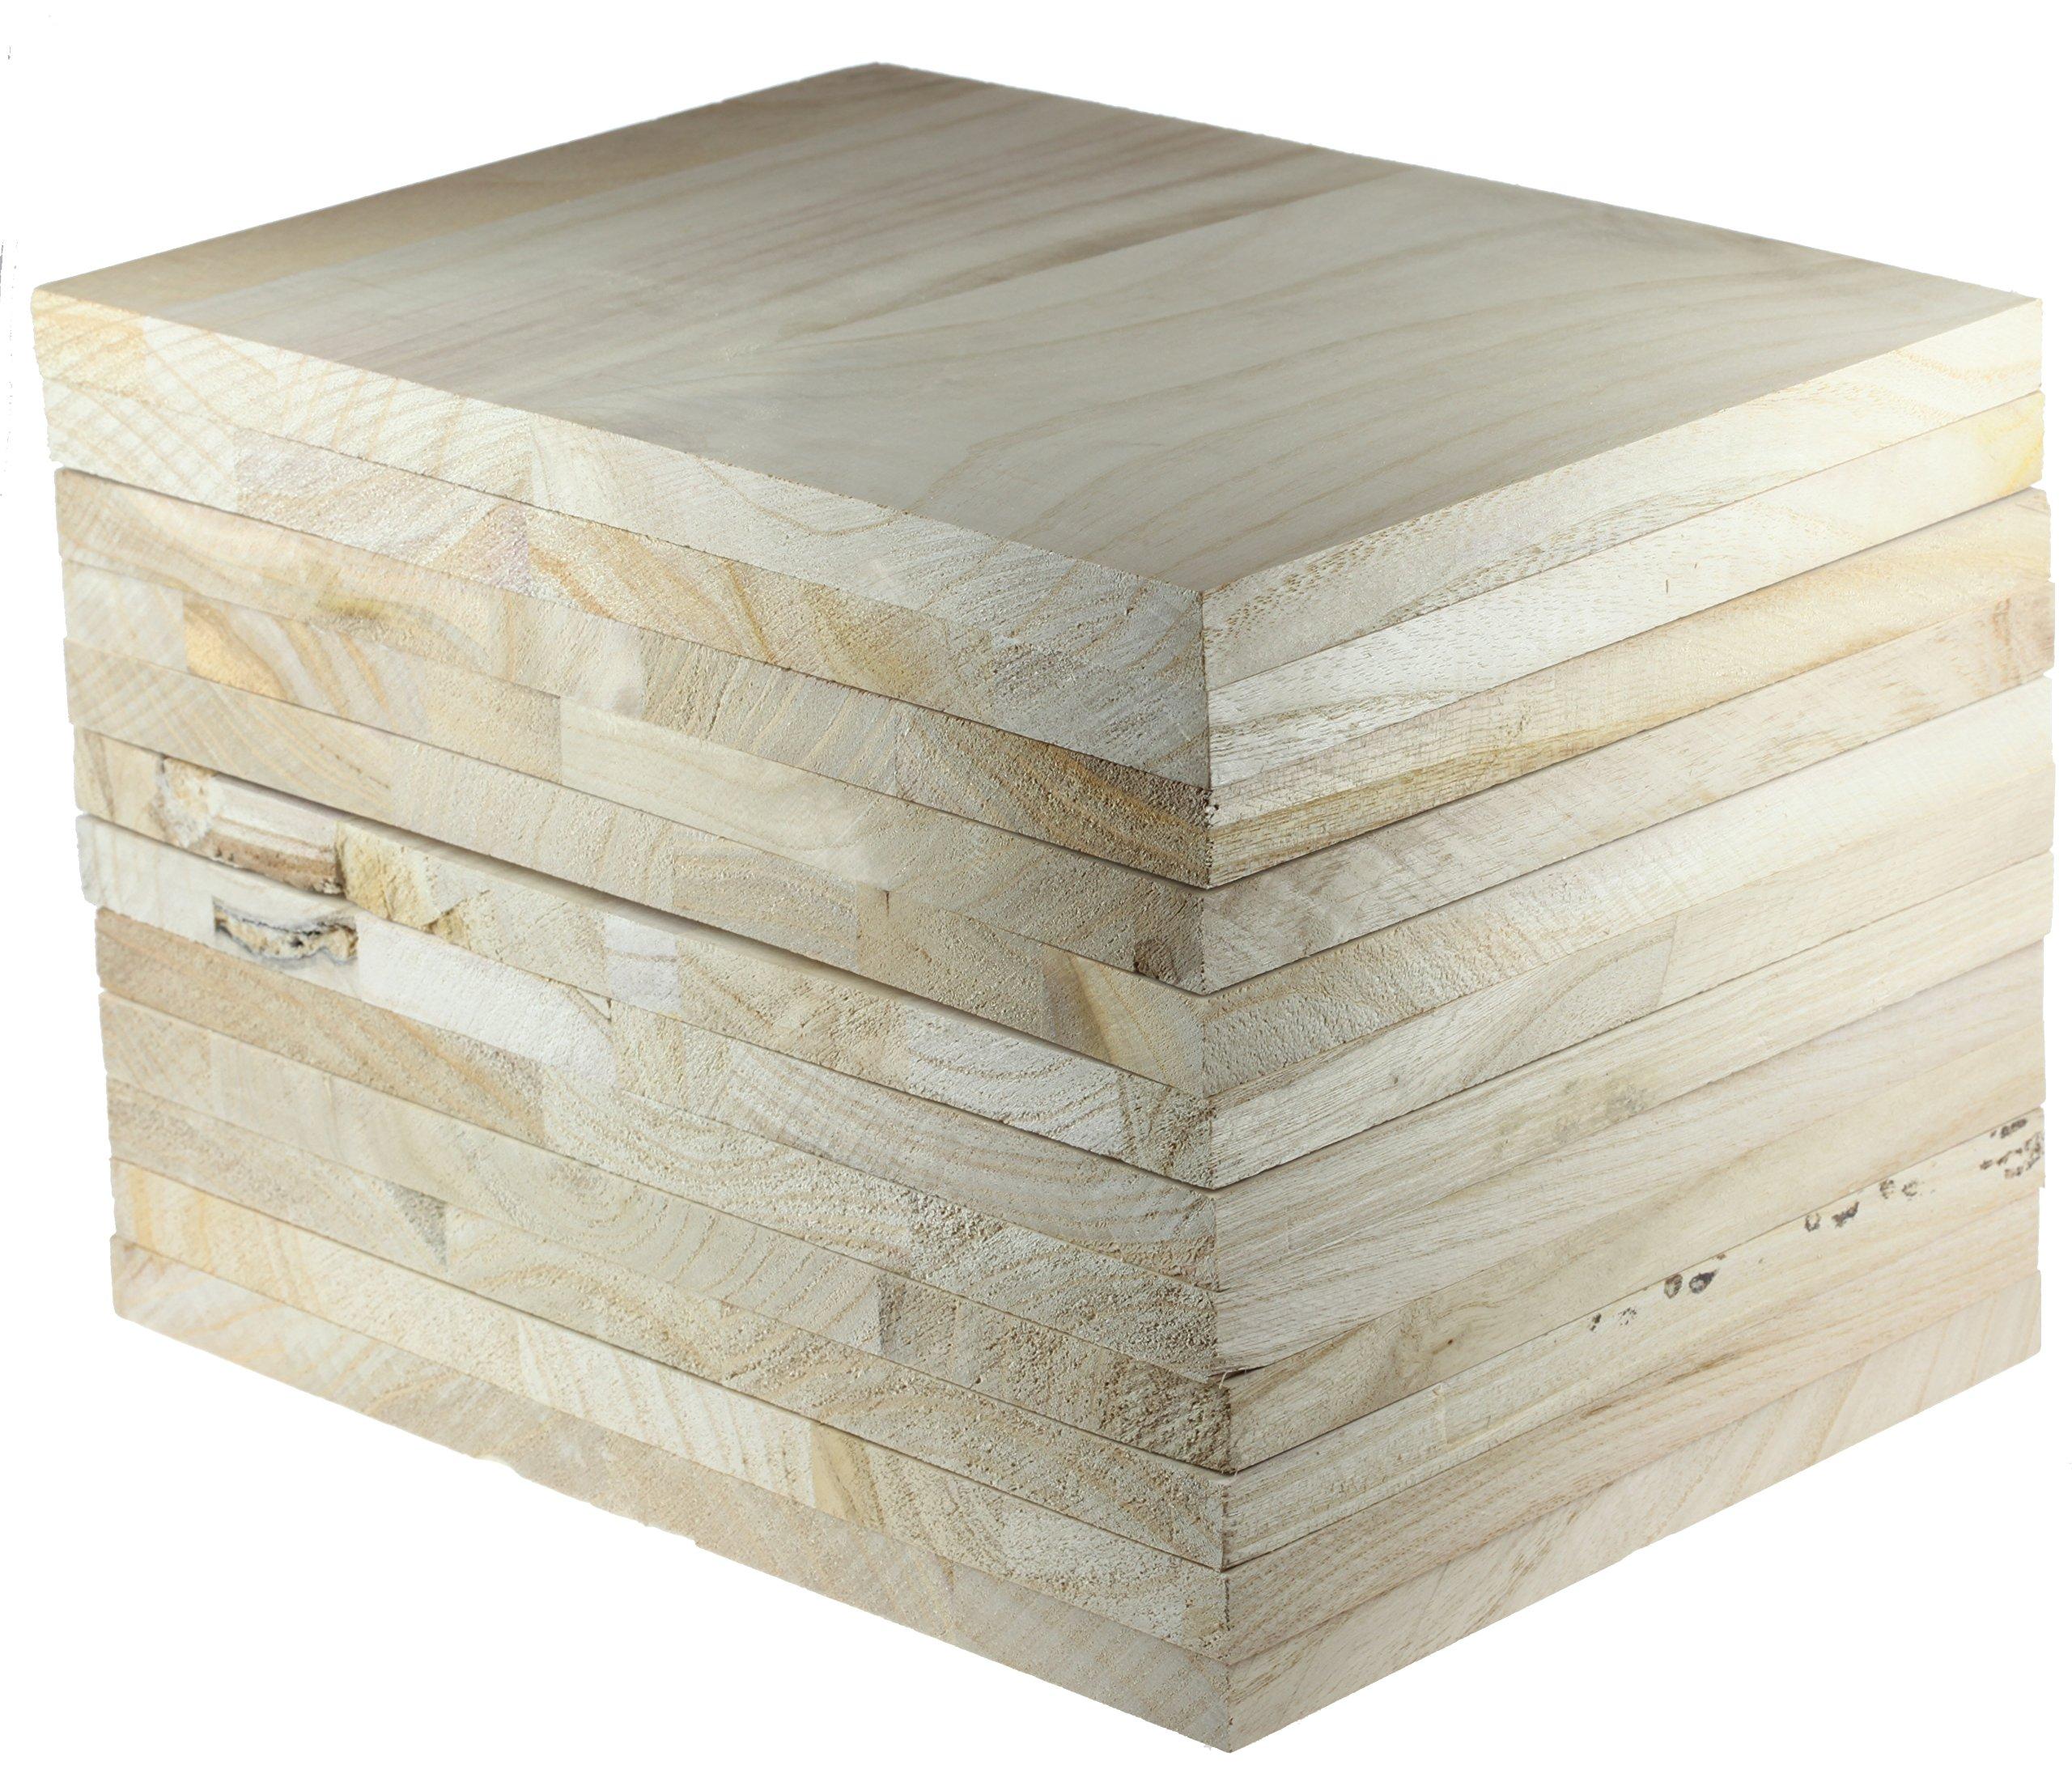 Tiger Claw Wood Breaking Board - Breakable Board in 18 mm Thickness (12 Board Pack)